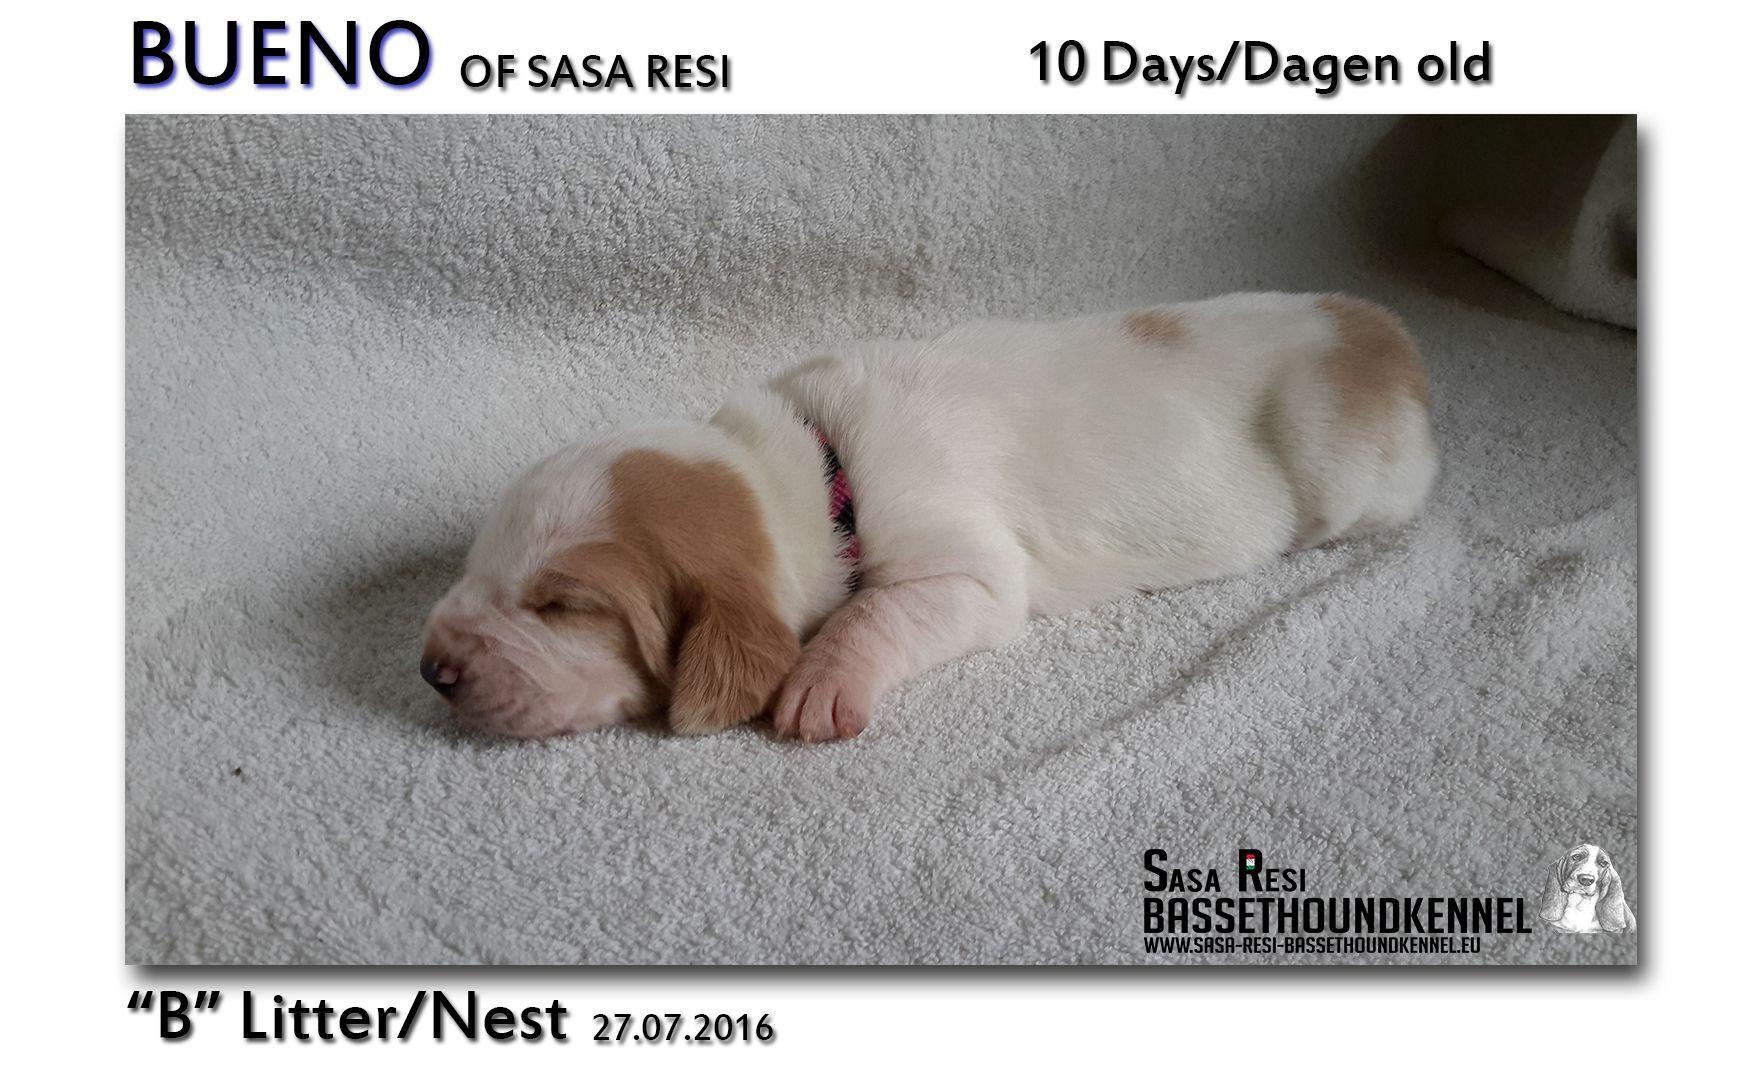 3 2 SaSa ReSi Bassethoundkennel